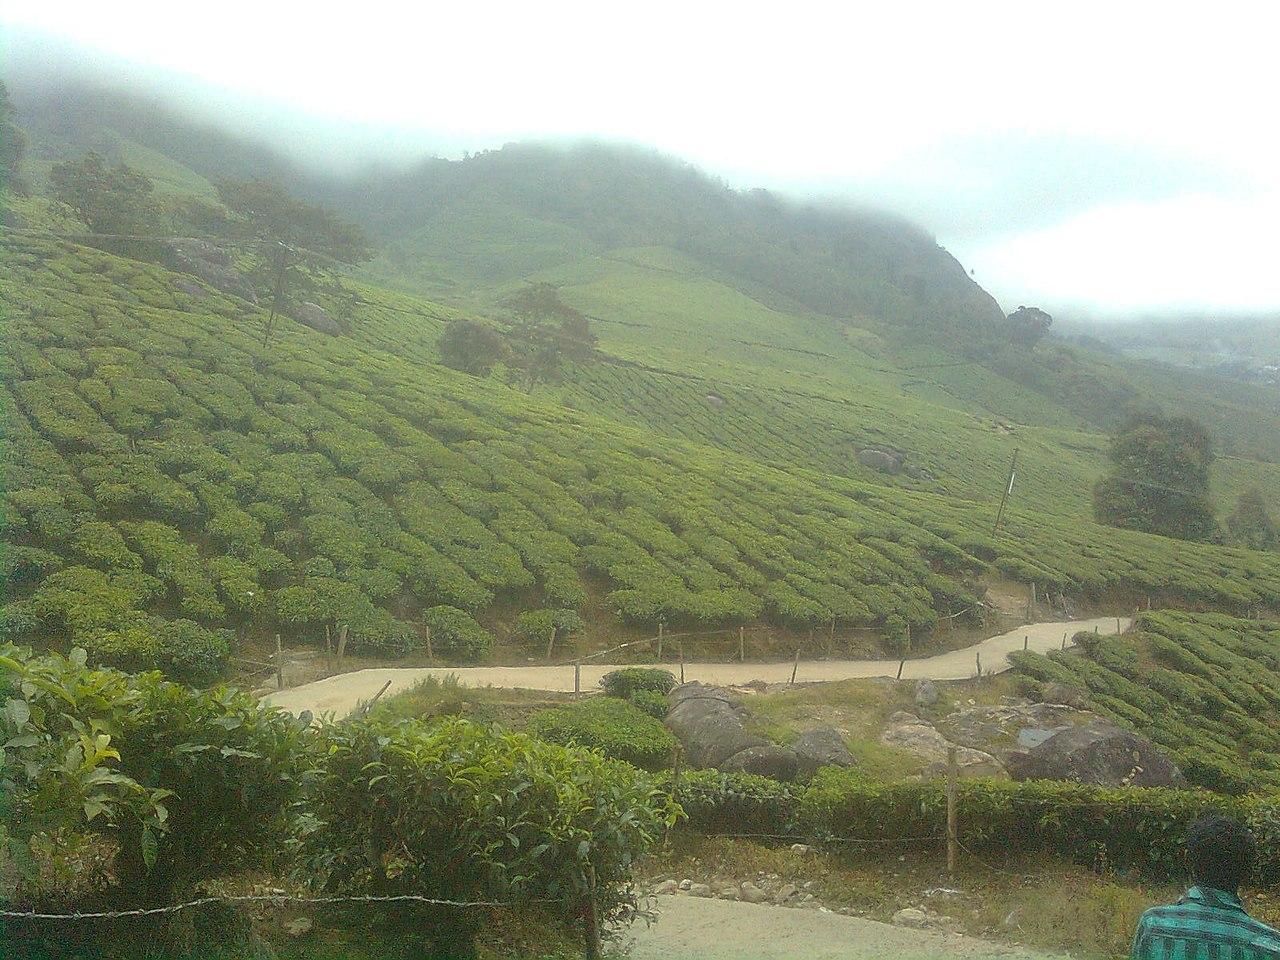 https://upload.wikimedia.org/wikipedia/commons/thumb/1/10/Suryanelli_Tea_Forest.jpeg/1280px-Suryanelli_Tea_Forest.jpeg